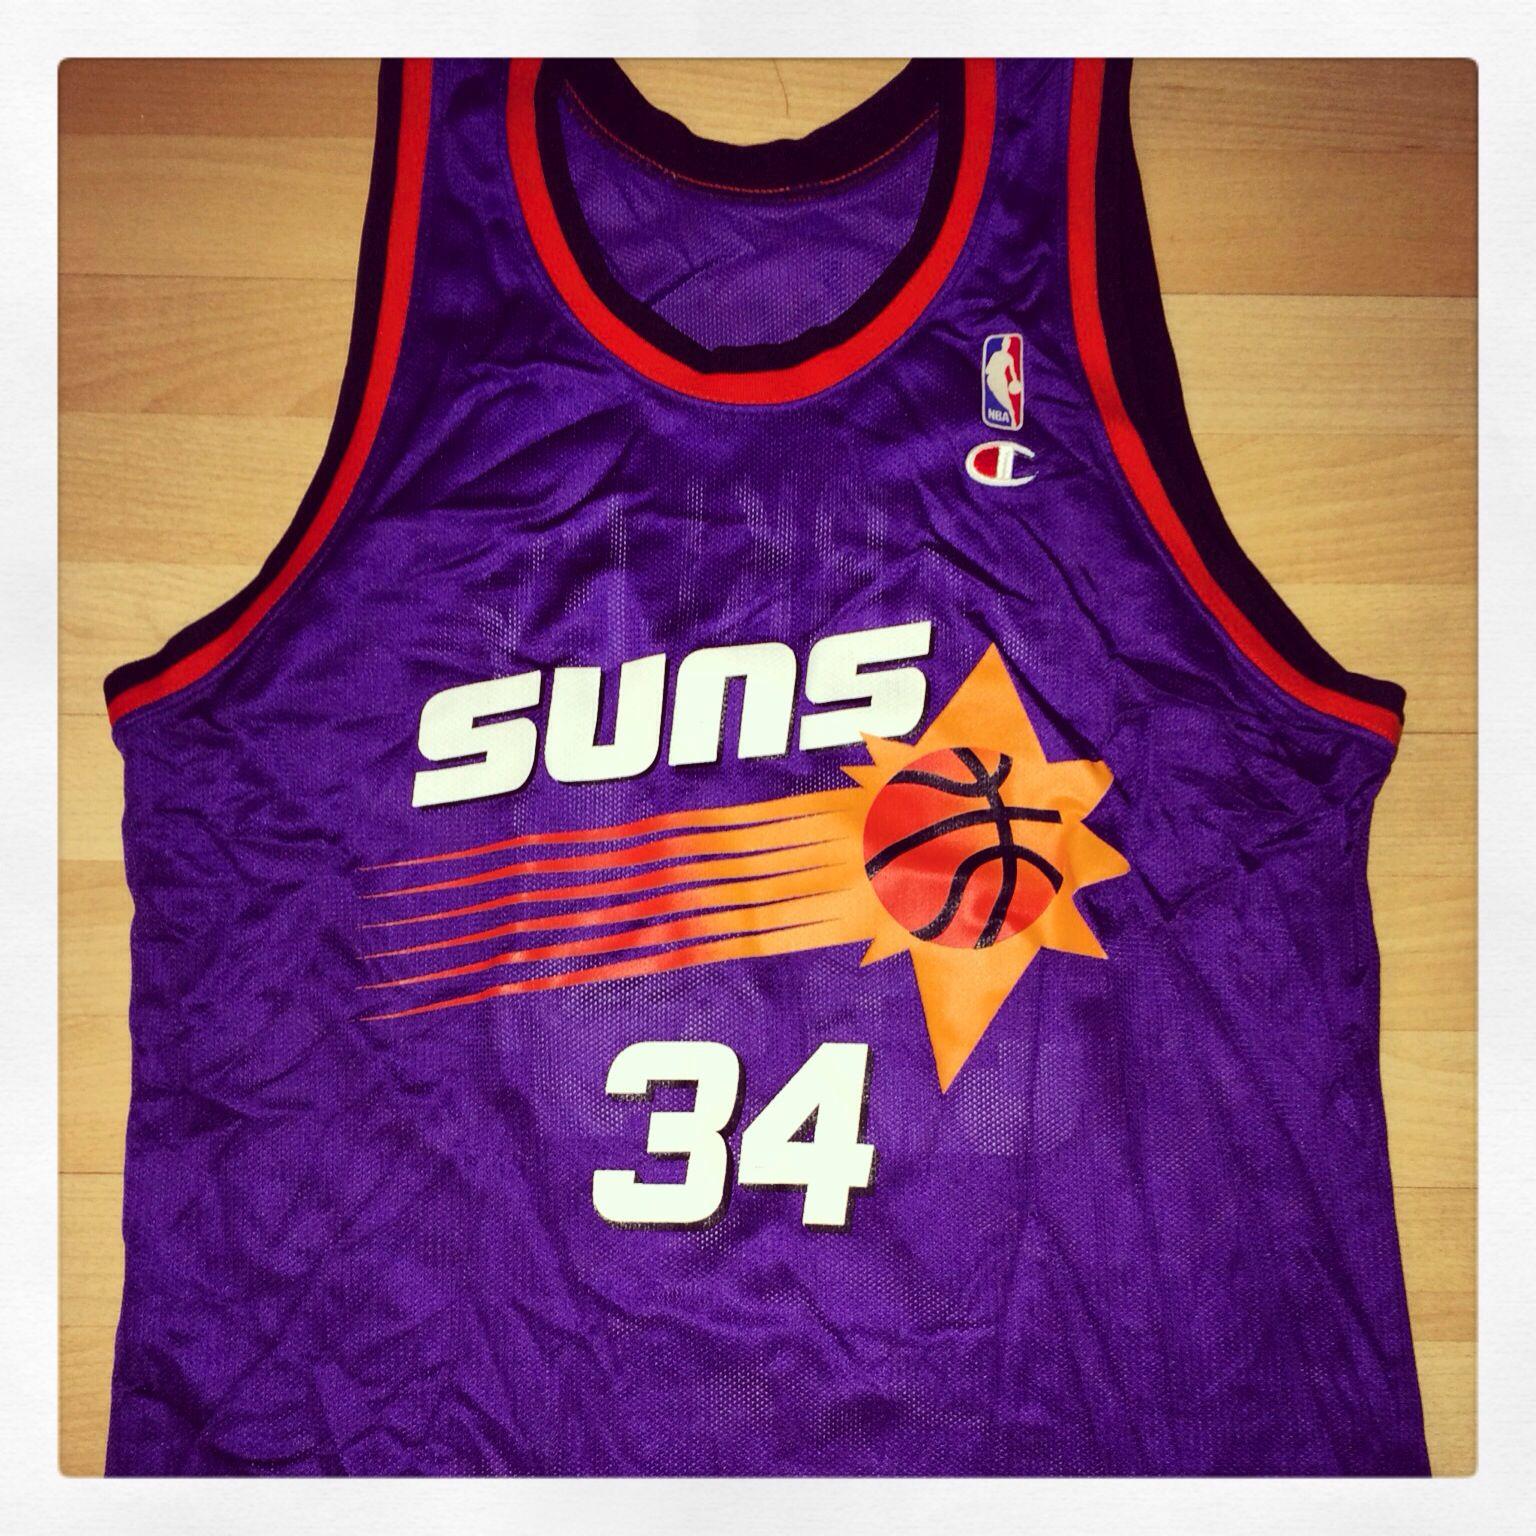 greece charles barkley phoenix suns champion jersey 2d221 d41e0 e022e0d56